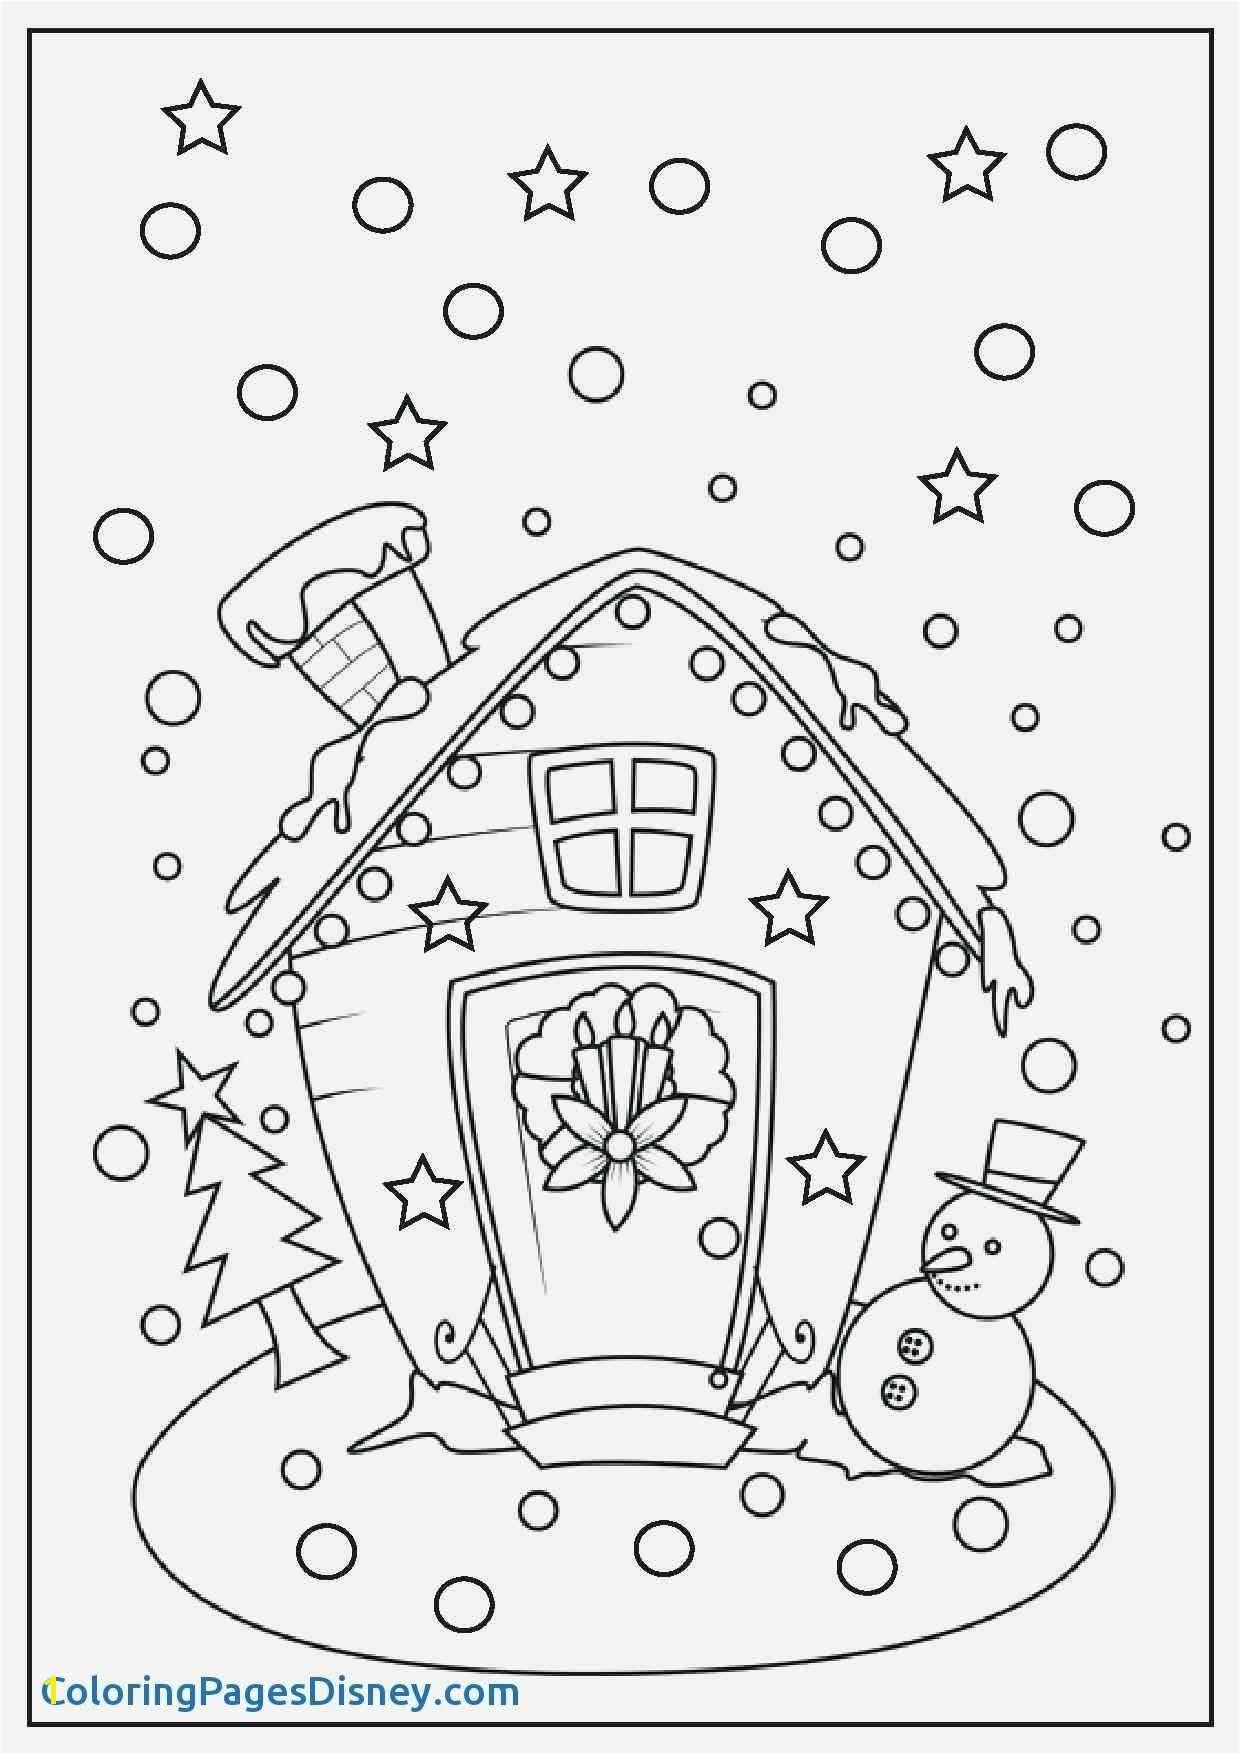 Free Printable Disney Princess Christmas Coloring Pages Cool Coloring Pages Printable New Printable Cds 0d Coloring